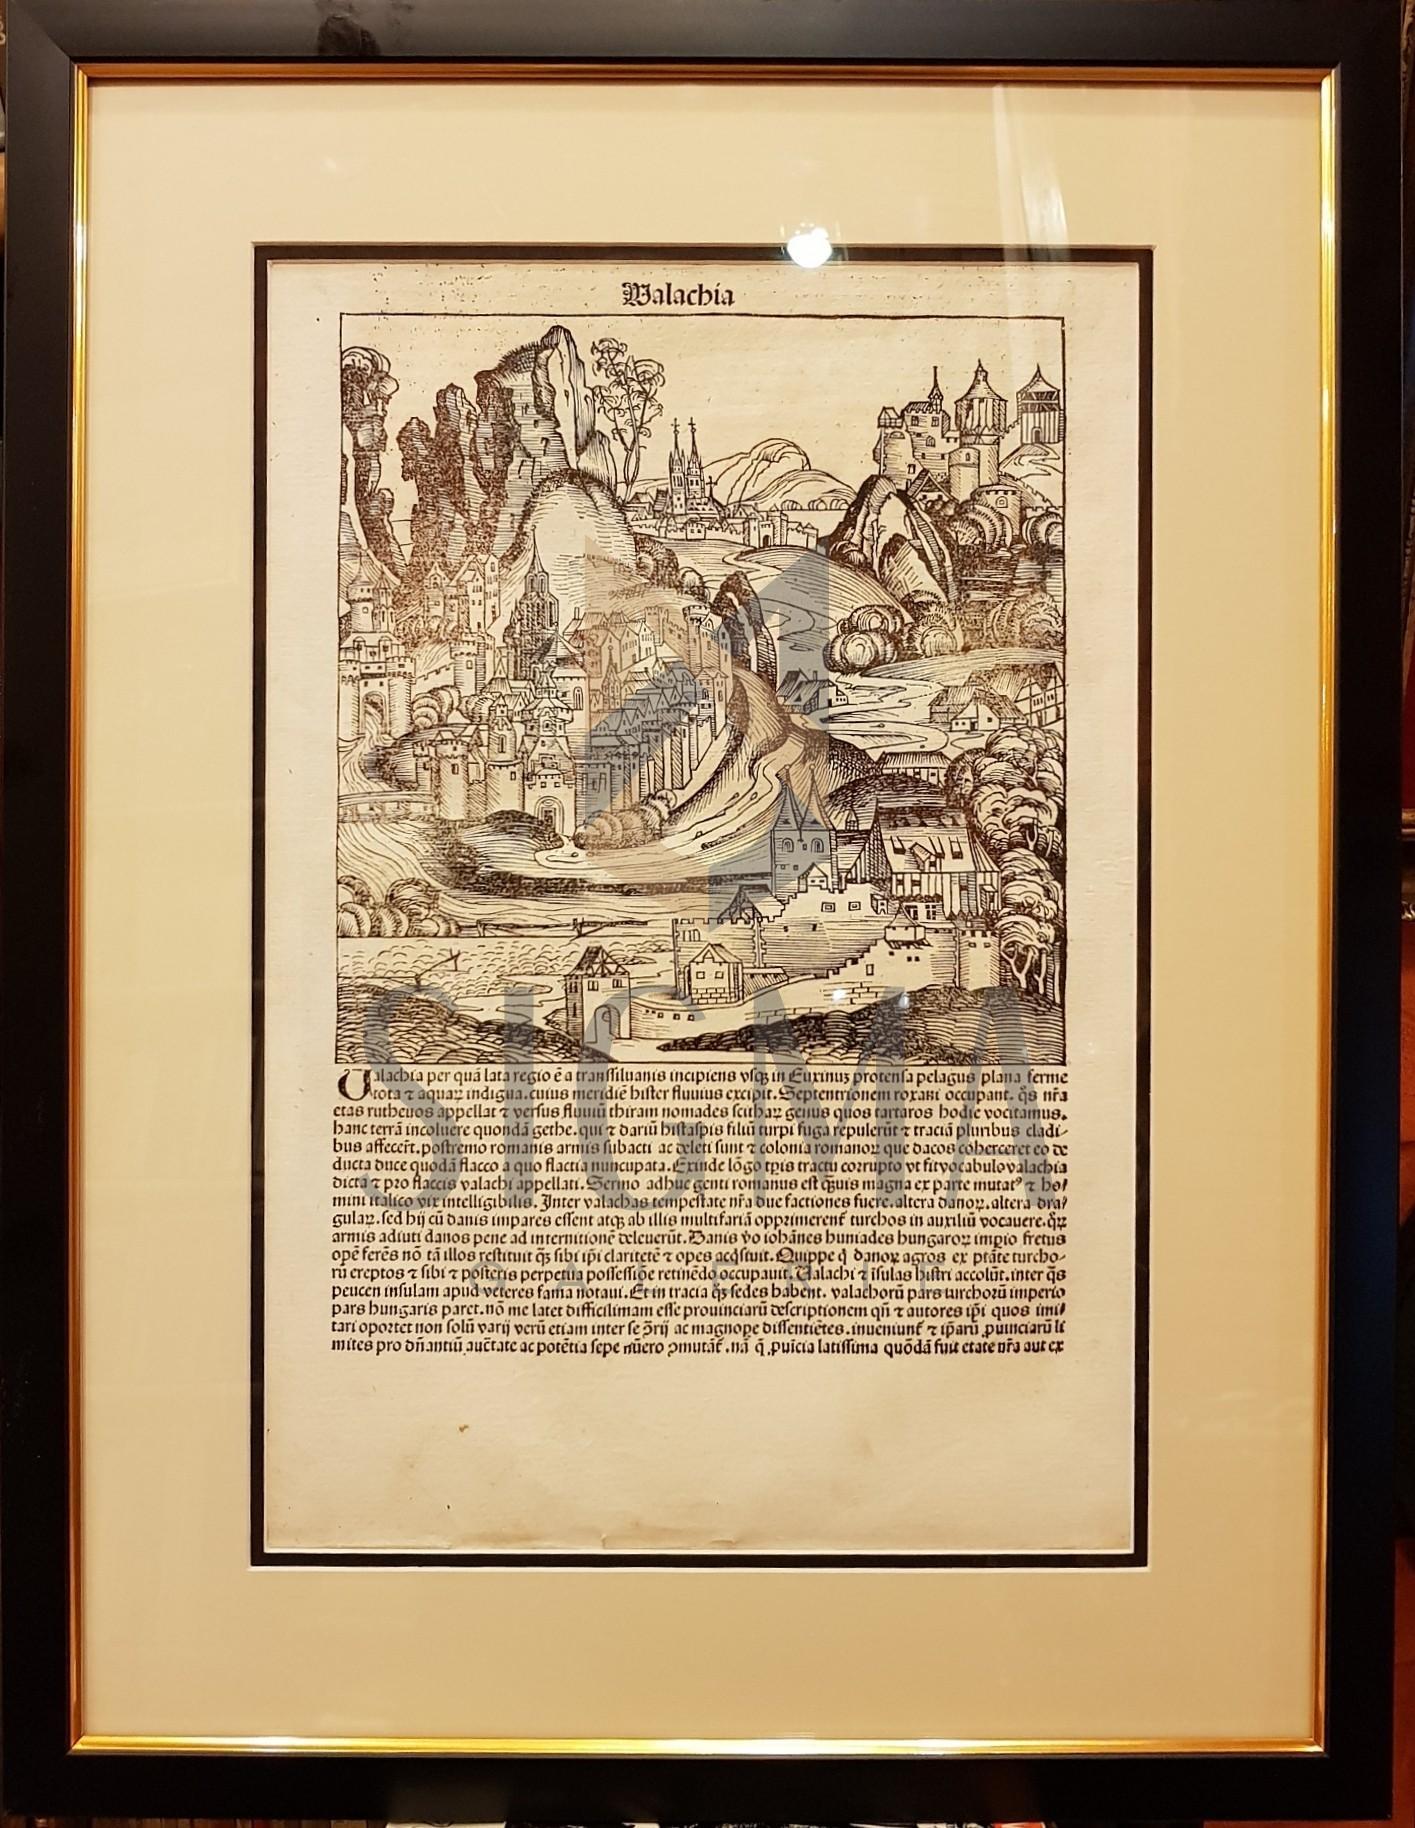 HARTMANN SCHEDEL (Cartograf, Nascut 1440 - Decedat 1514), ANTON KOBERGER (Editor)